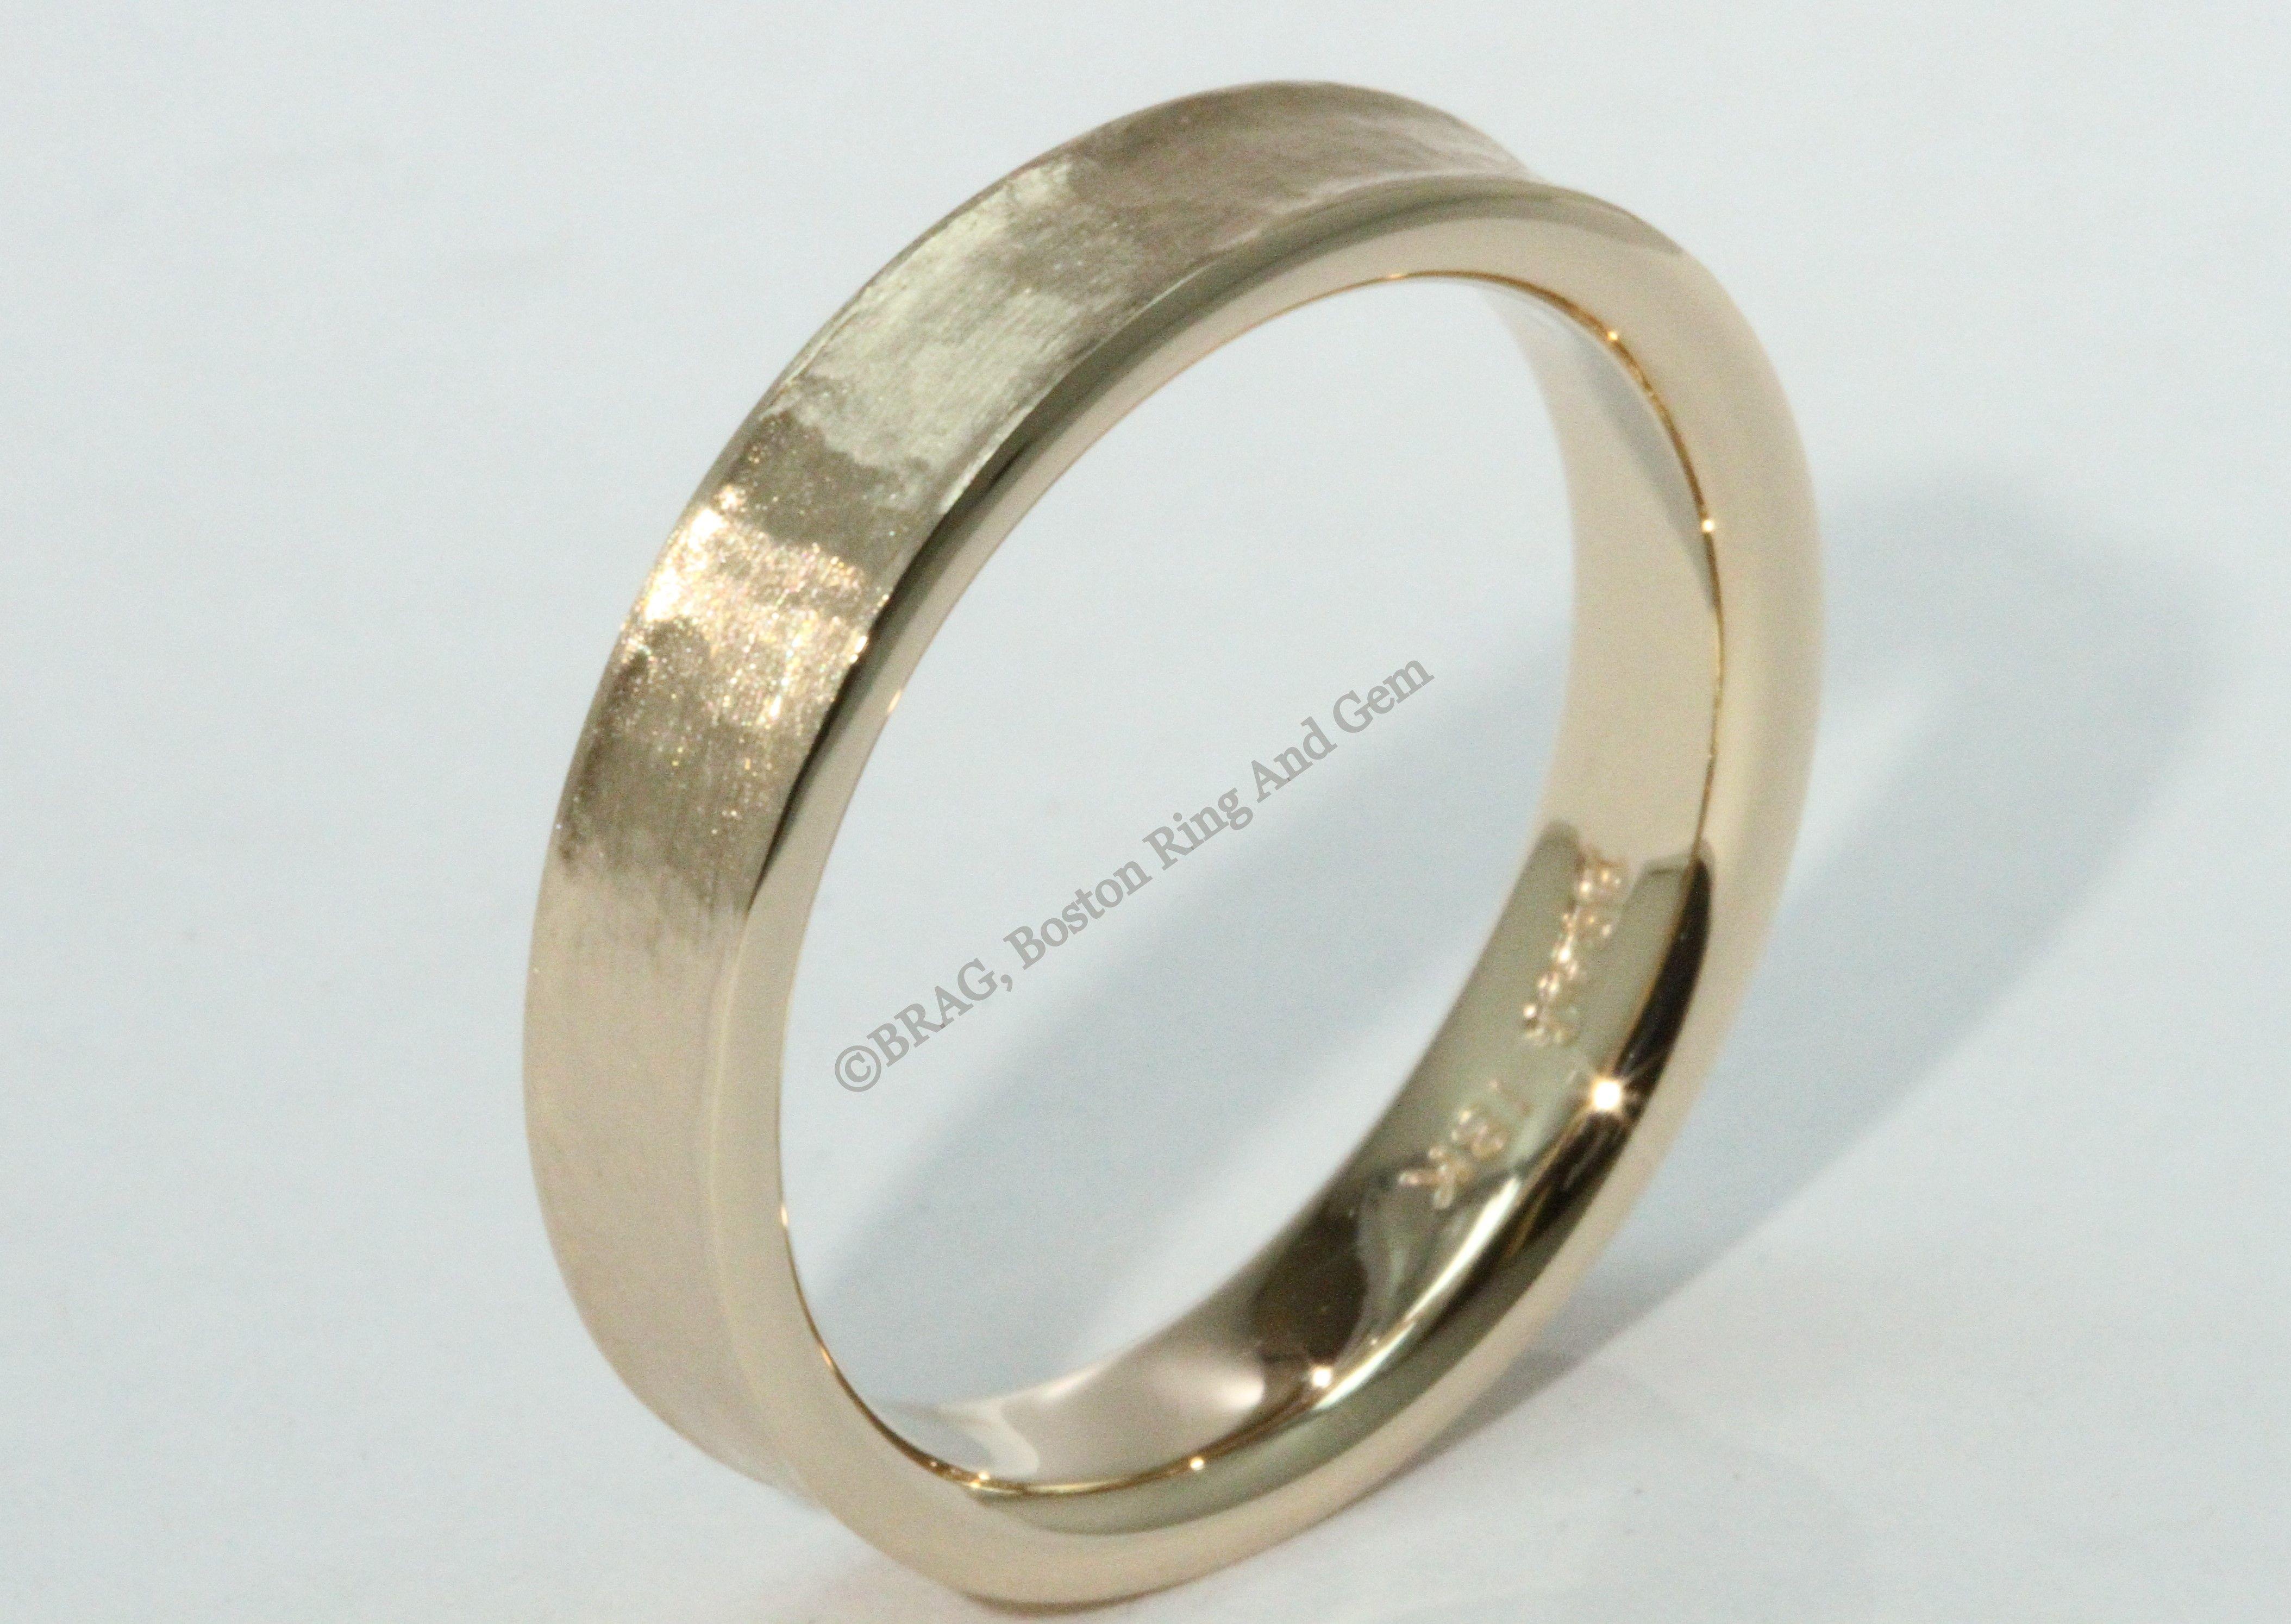 18k Rose Gold Flat Hammered Men S Wedding Bands With High Polish Raised Edge Platinum Gold Rosegold Yello Mens Wedding Rings Boston Jewelry Wedding Rings